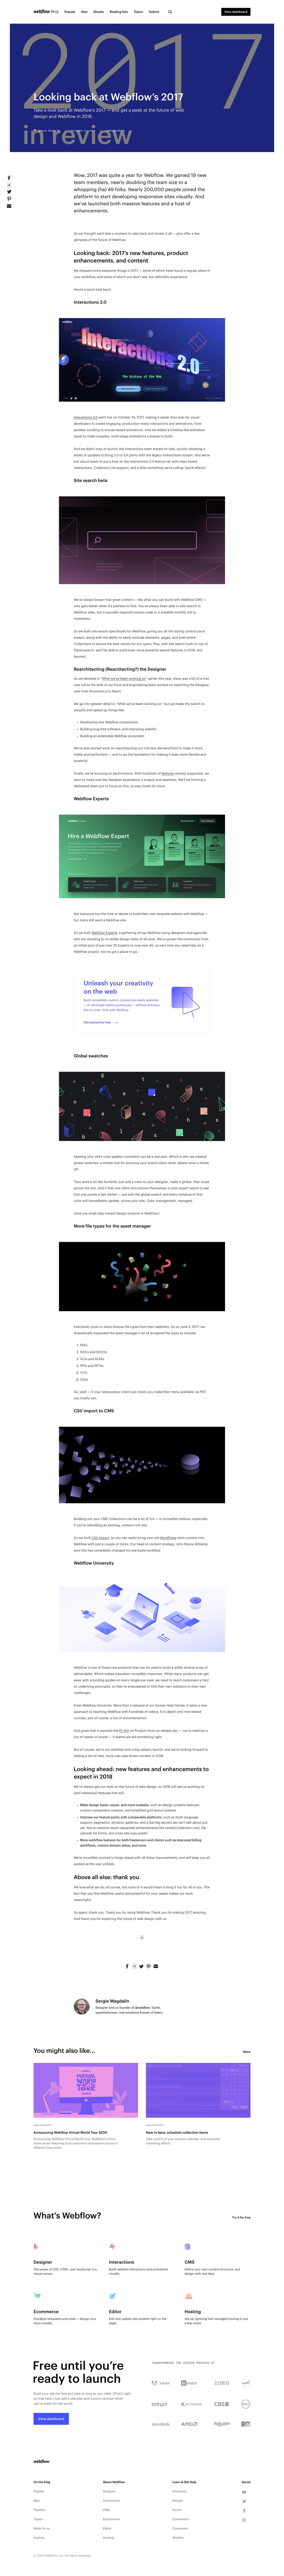 Webflow Year in Review